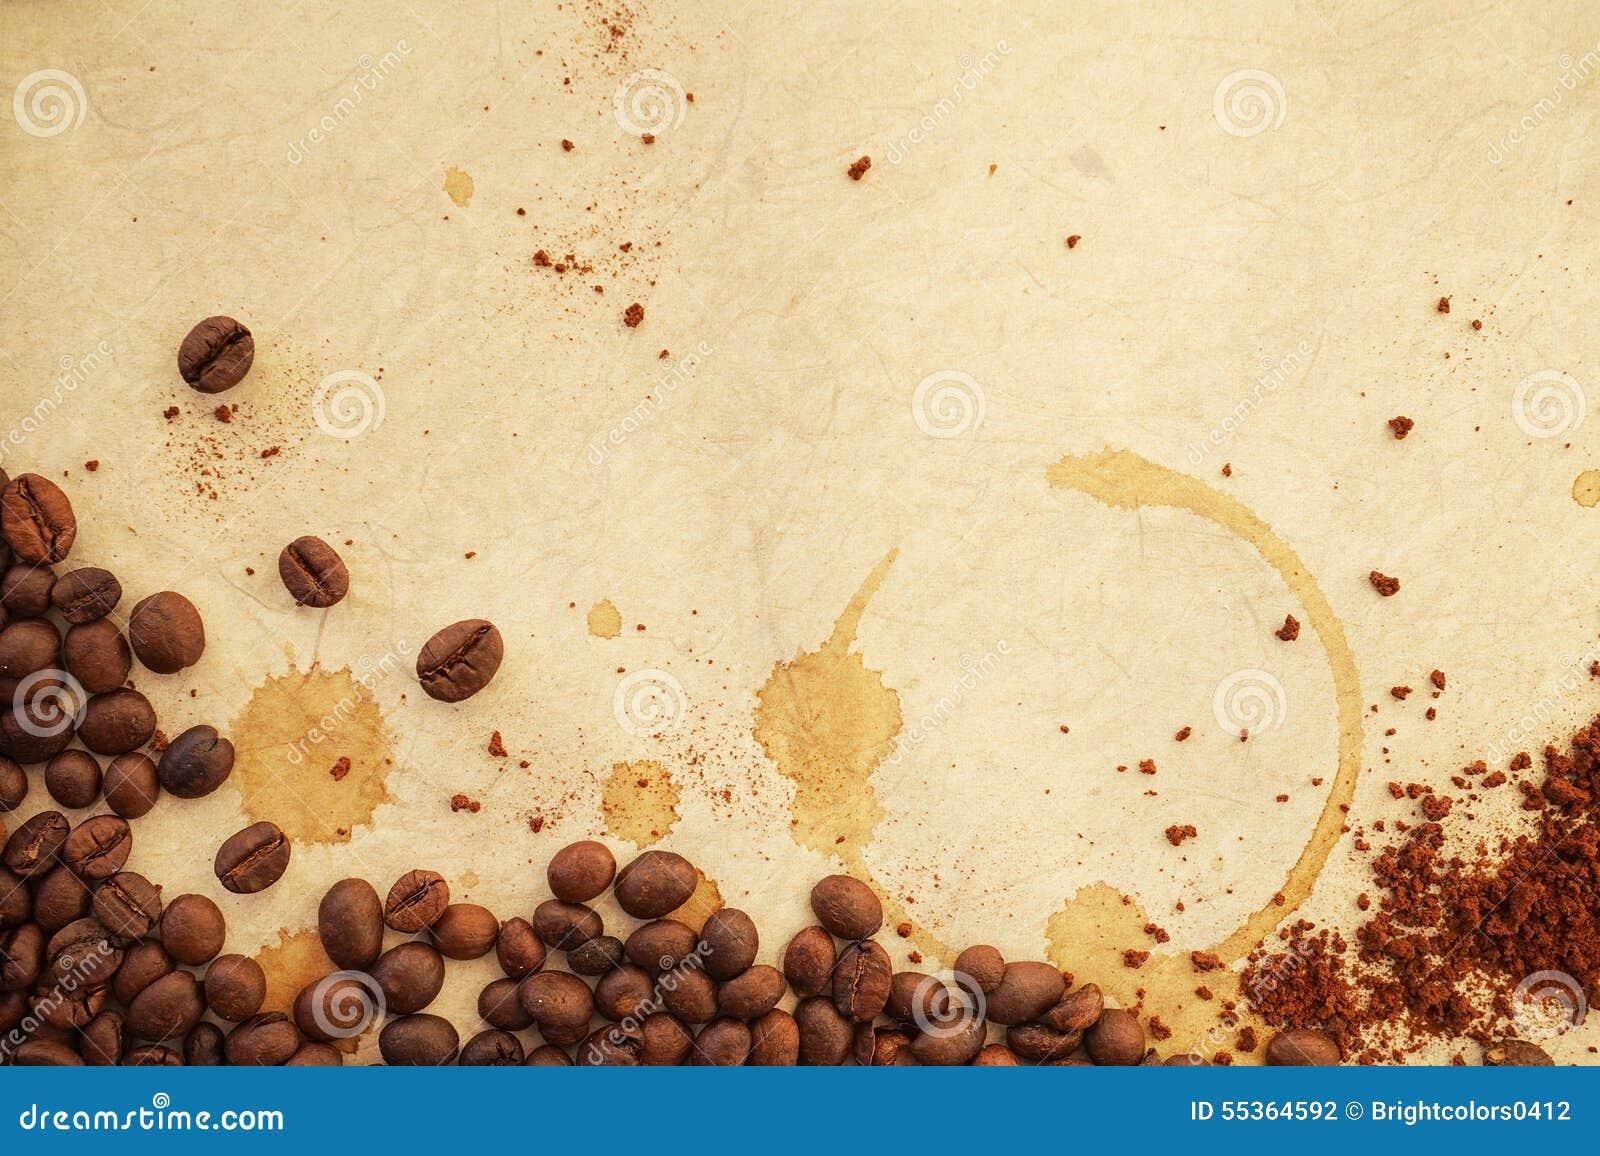 Caffè su vecchia carta